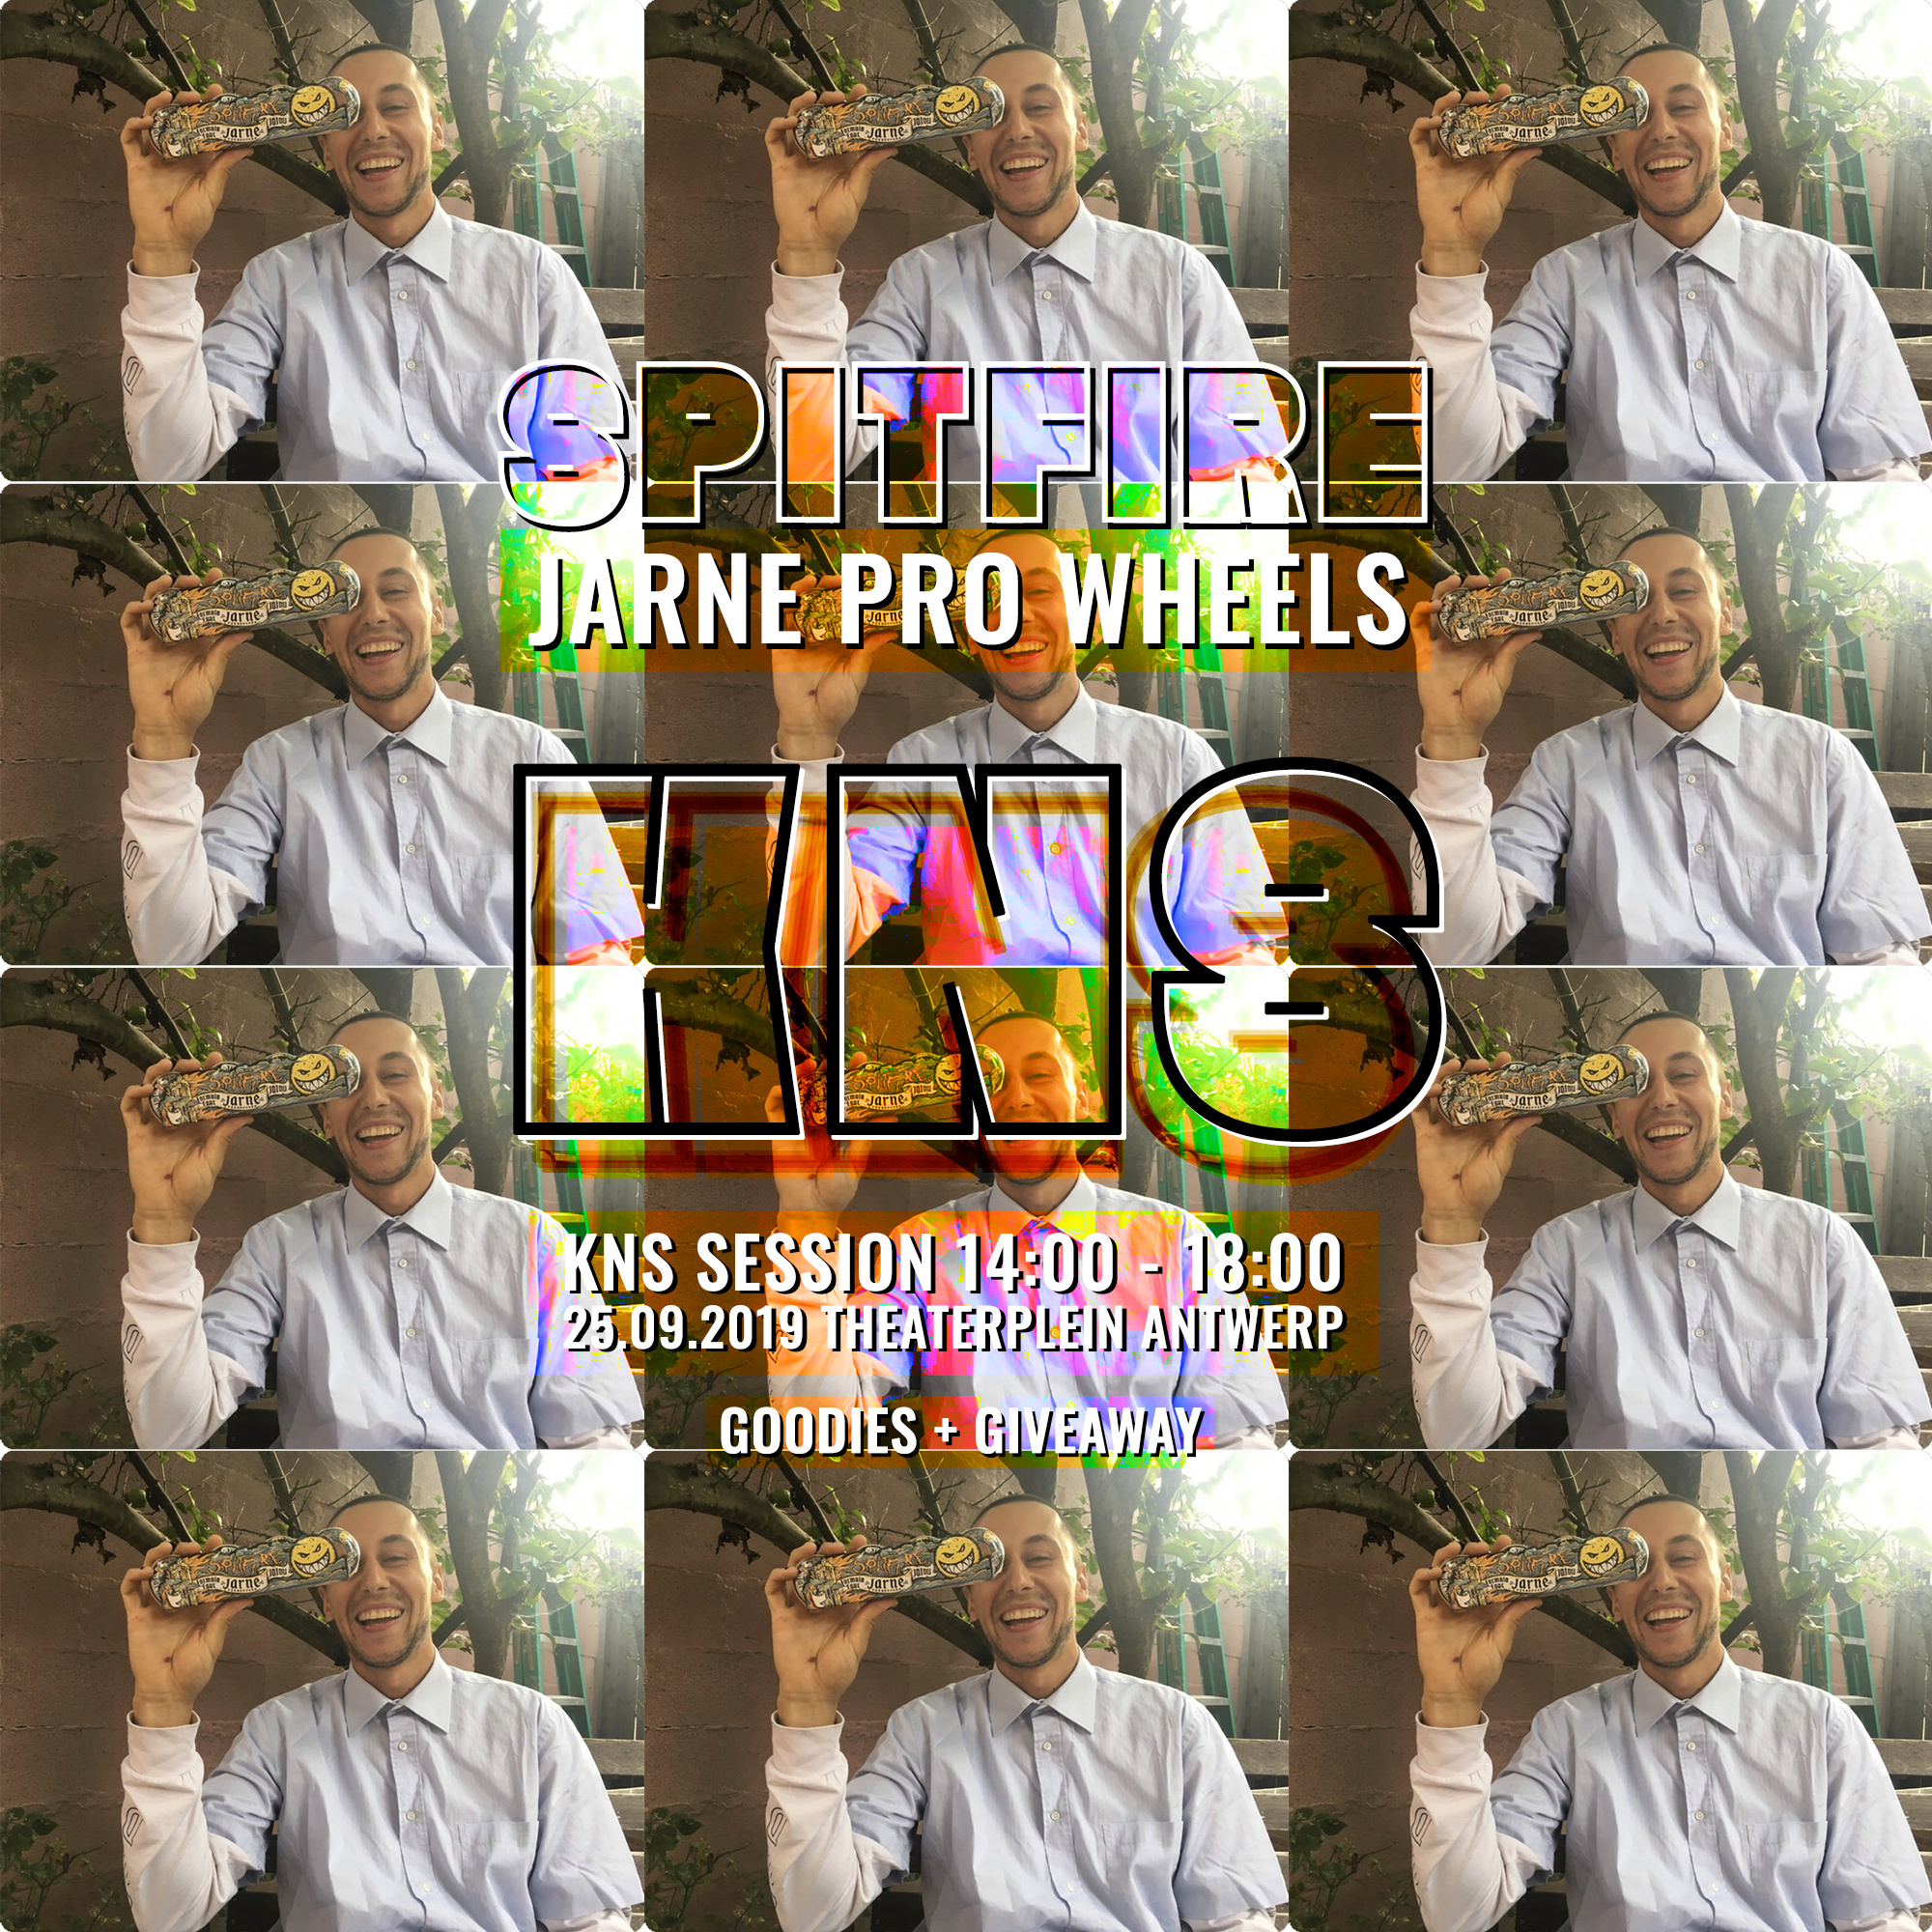 Whoohoo Jarne's Pro Wheels on Spitfire